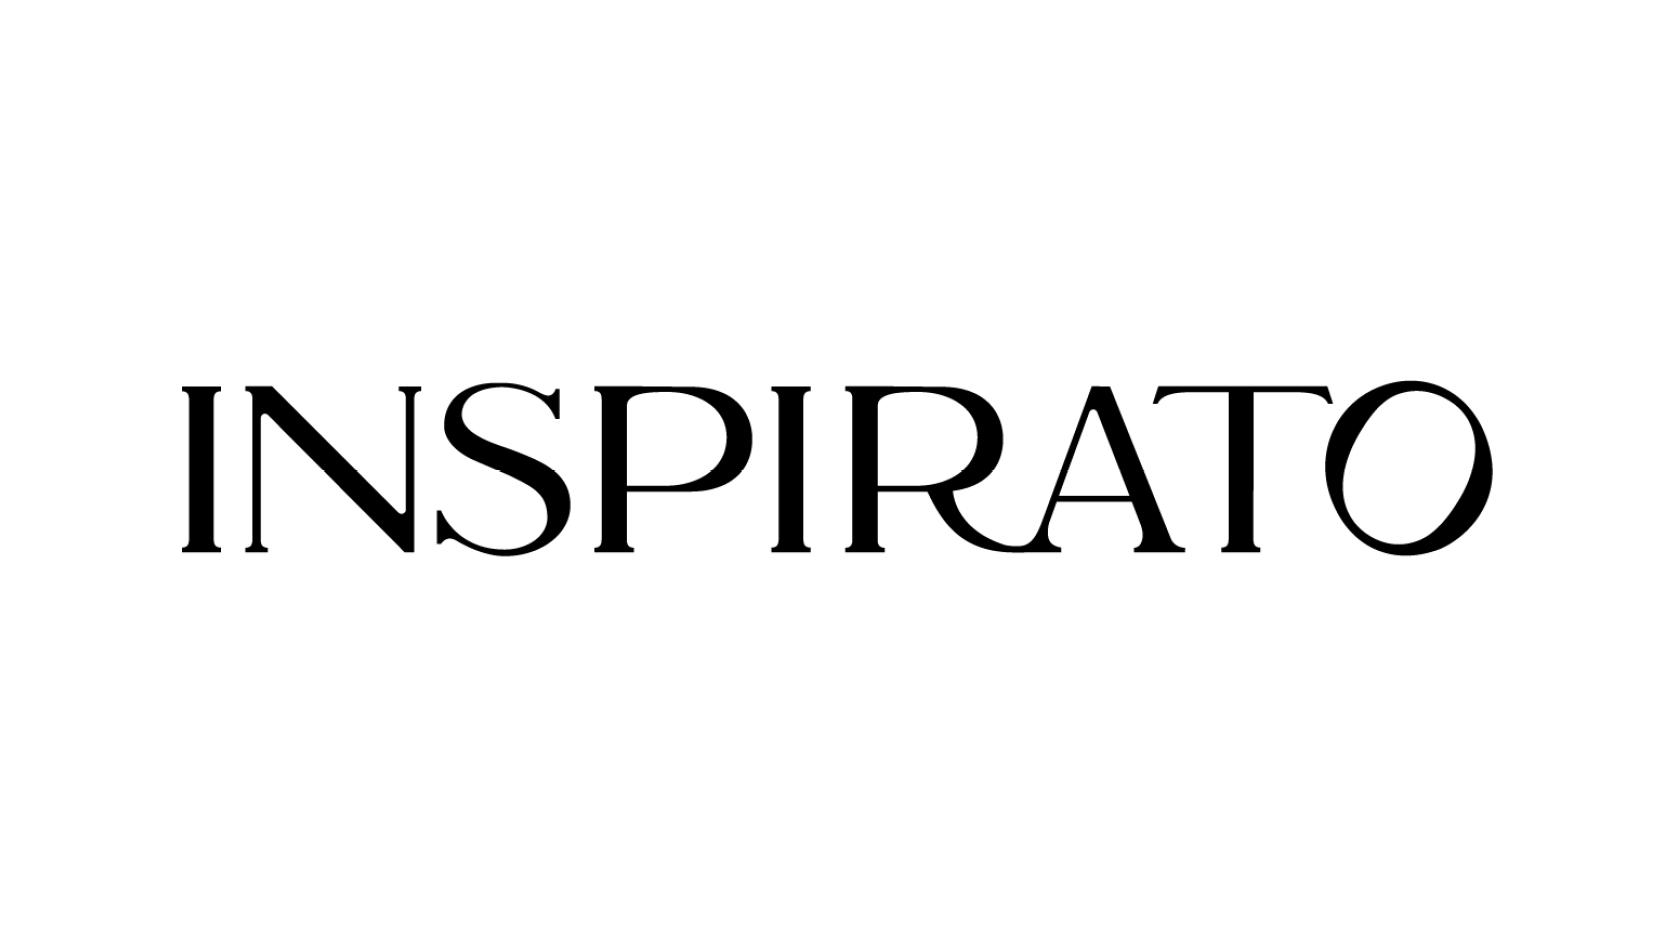 inspirato_k.png